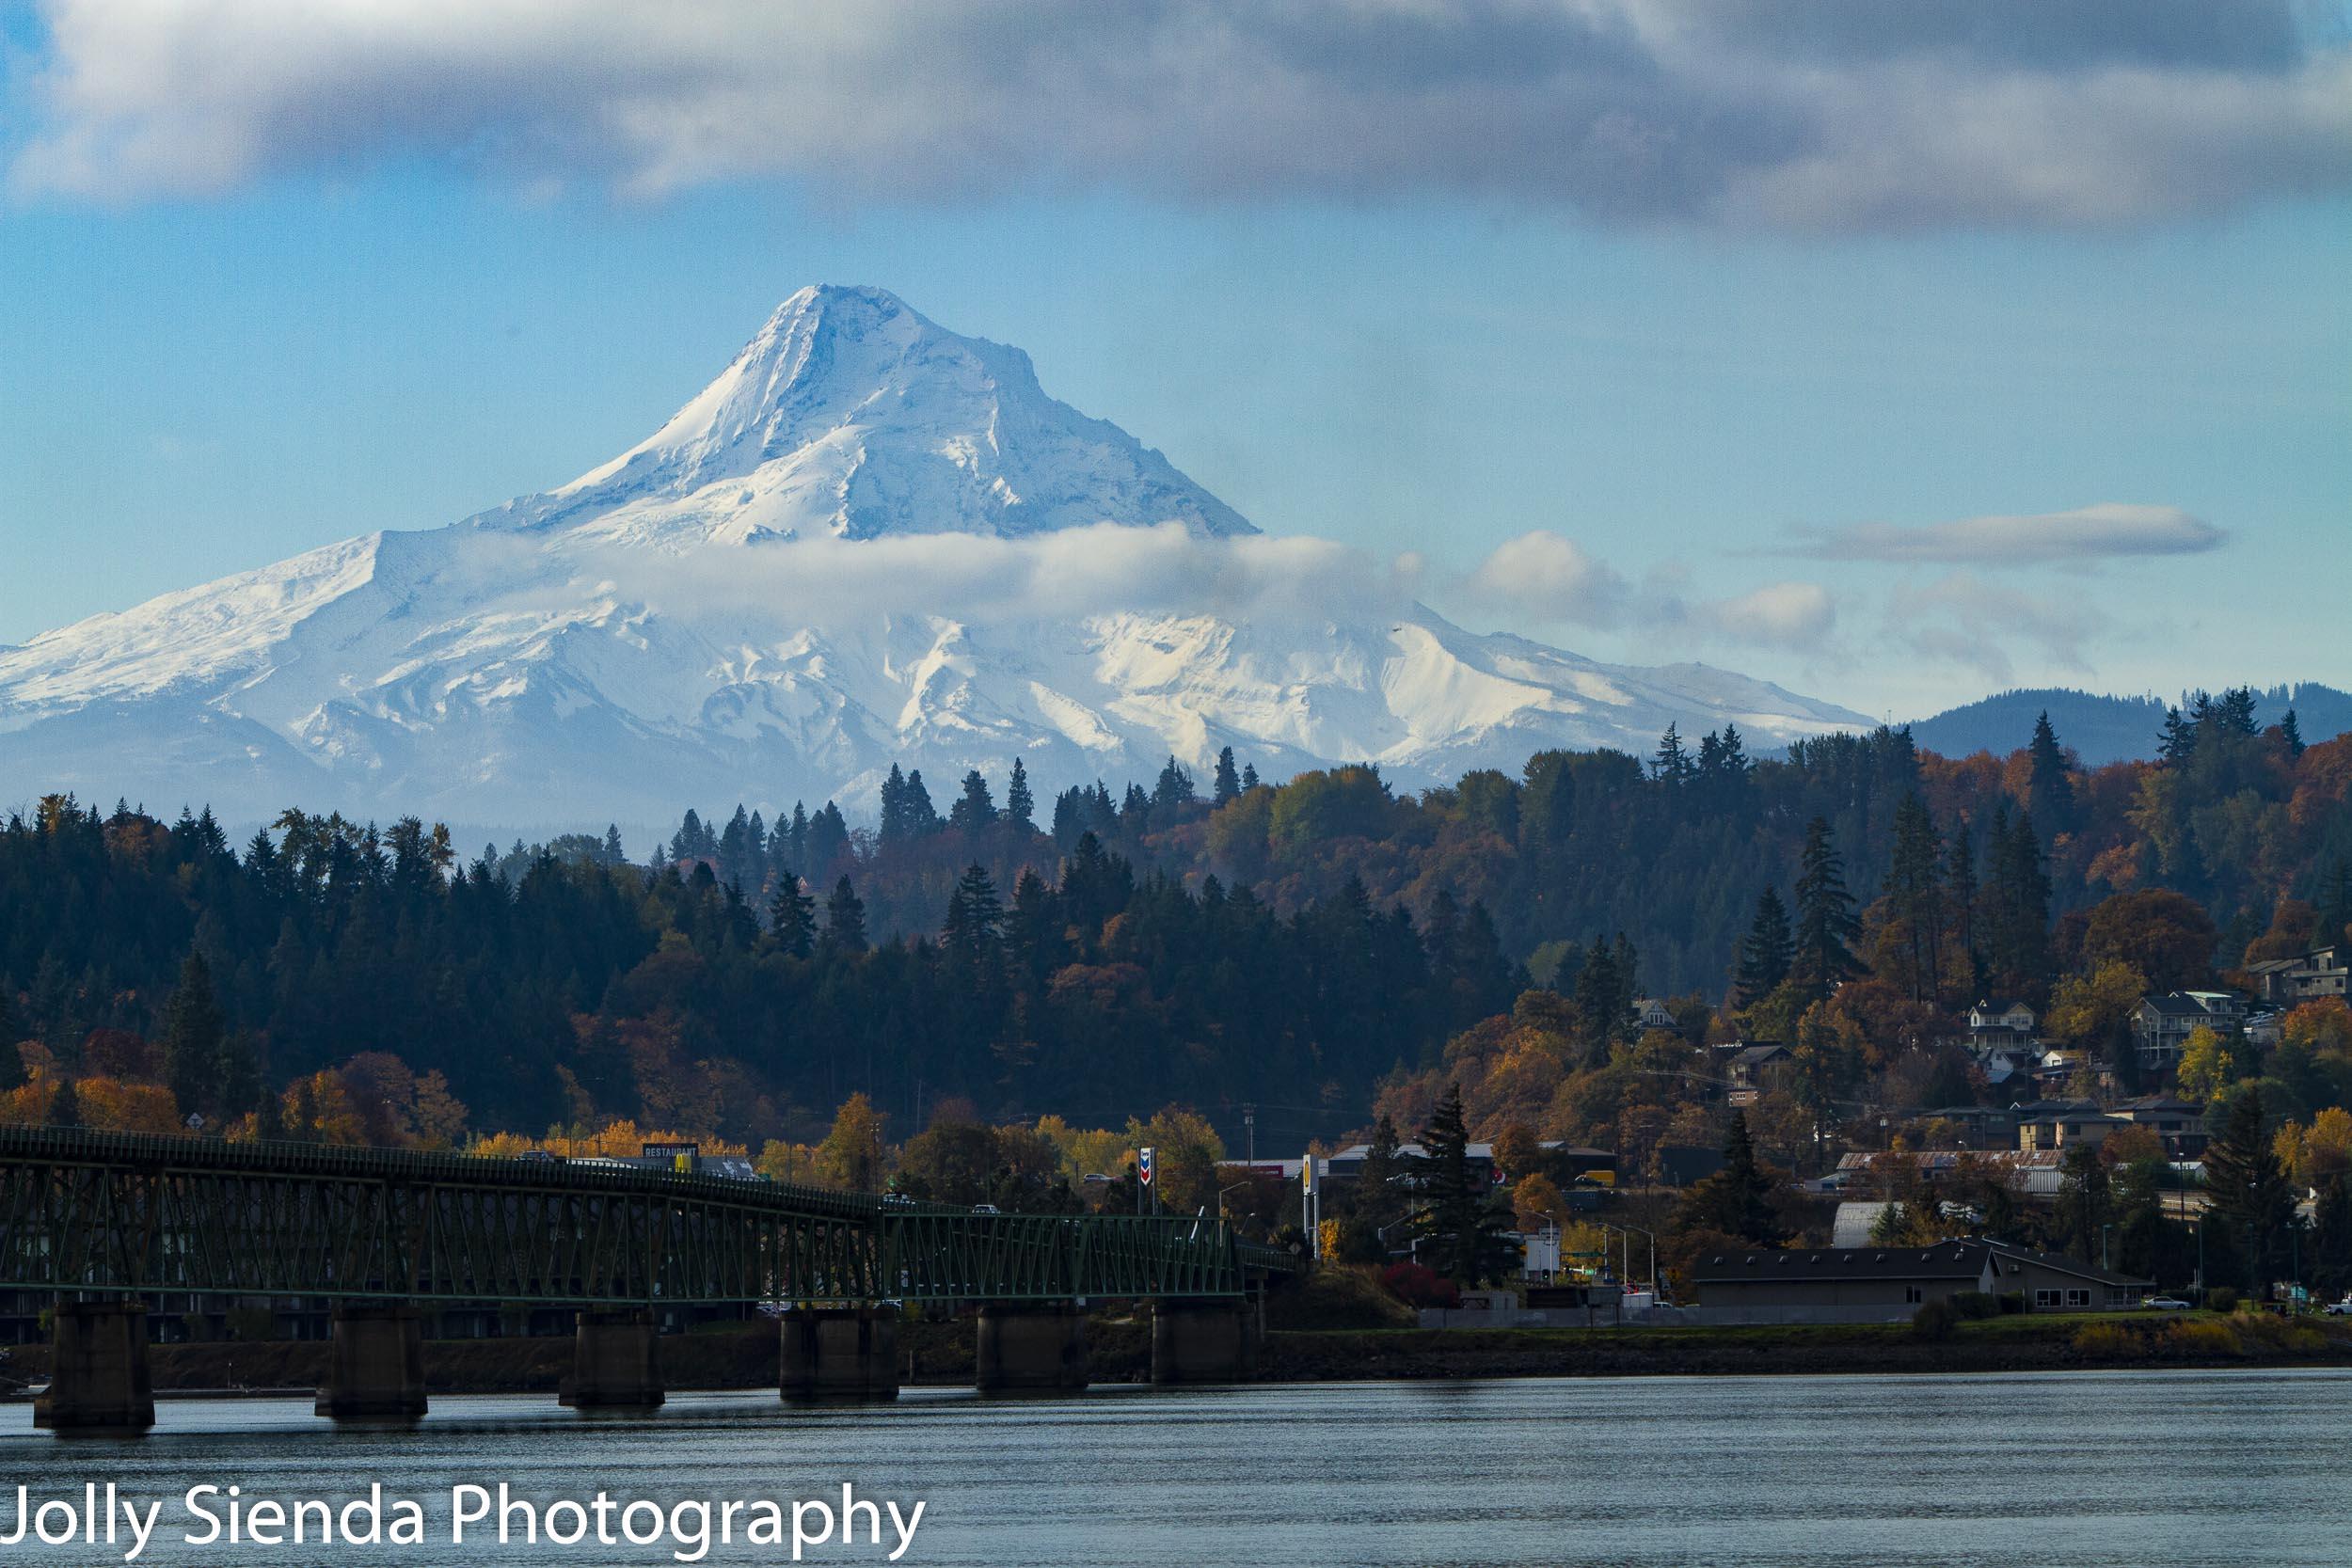 Mount Hood, Autumn, and the Hood River Bridge